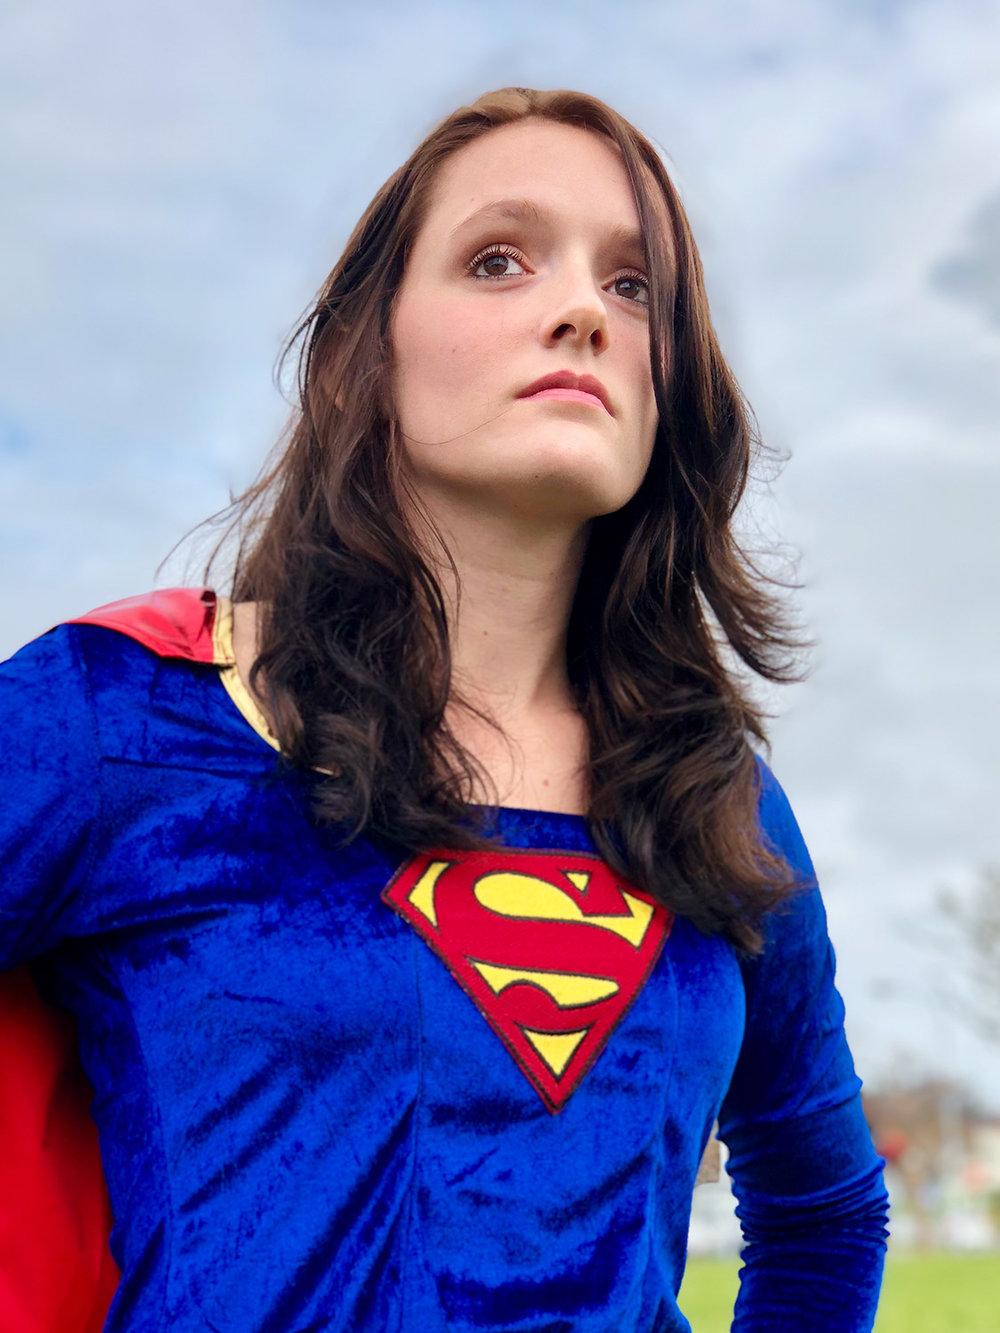 Supergirl #ShotOniPhone #ShotOniPhoneX using portrait mode.